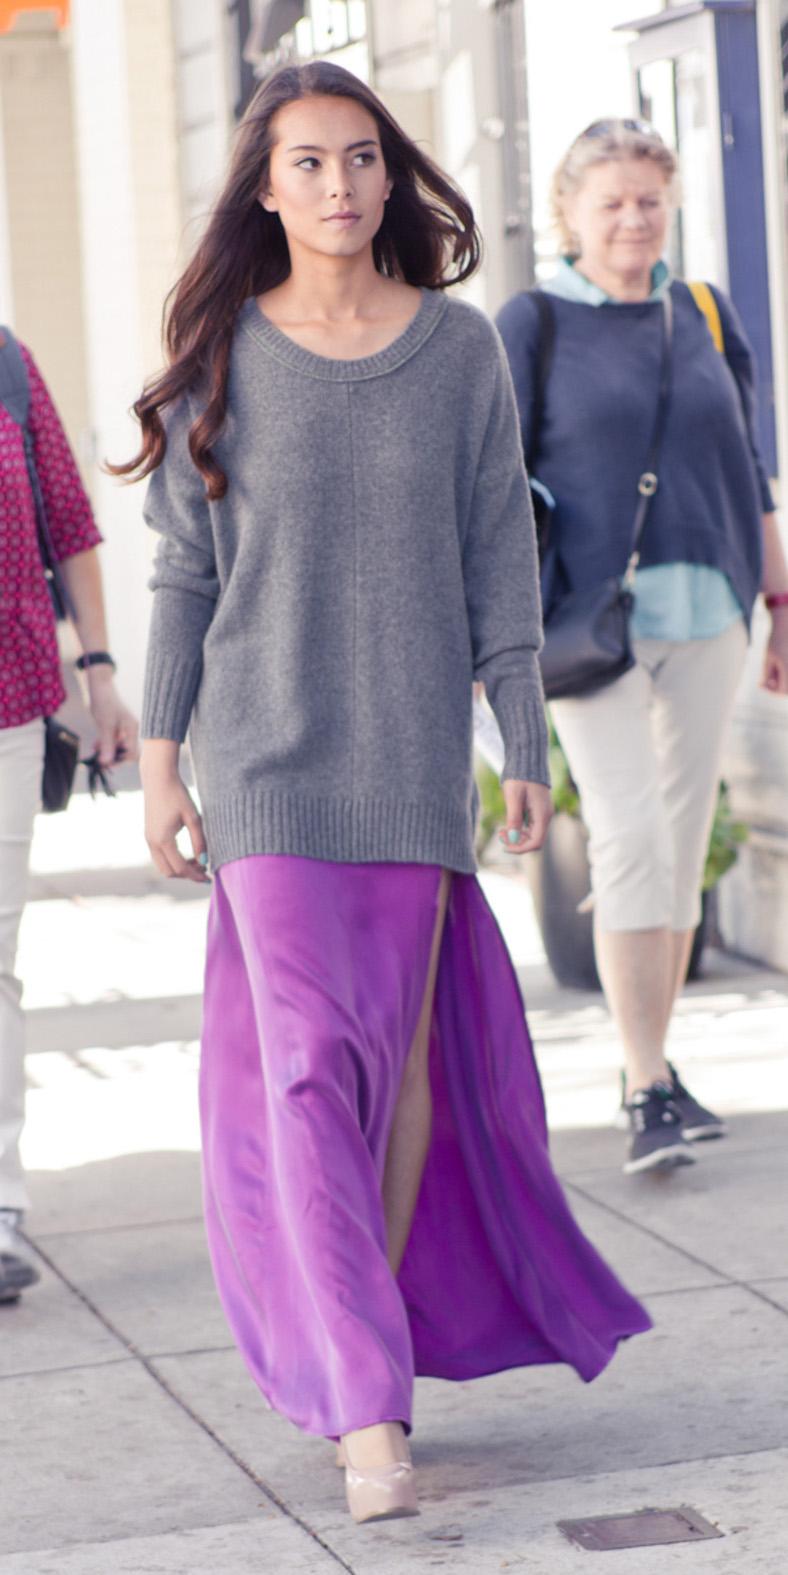 purple-royal-maxi-skirt-grayl-sweater-fall-winter-brun-lunch.jpg